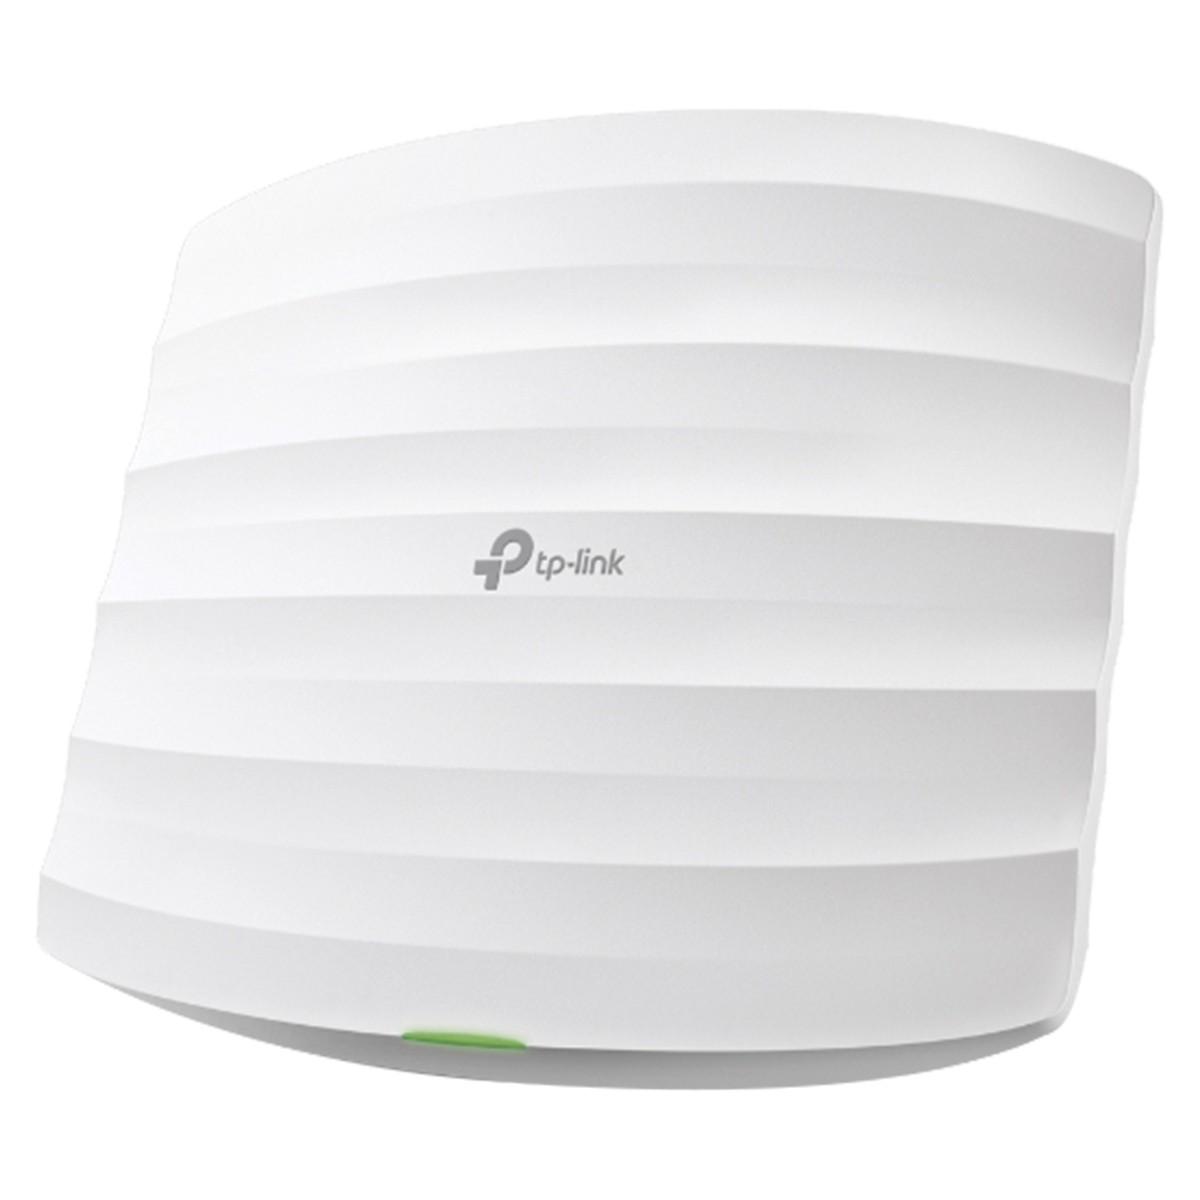 Access Point Wireless N 300MBPS Montavel em Teto EAP115